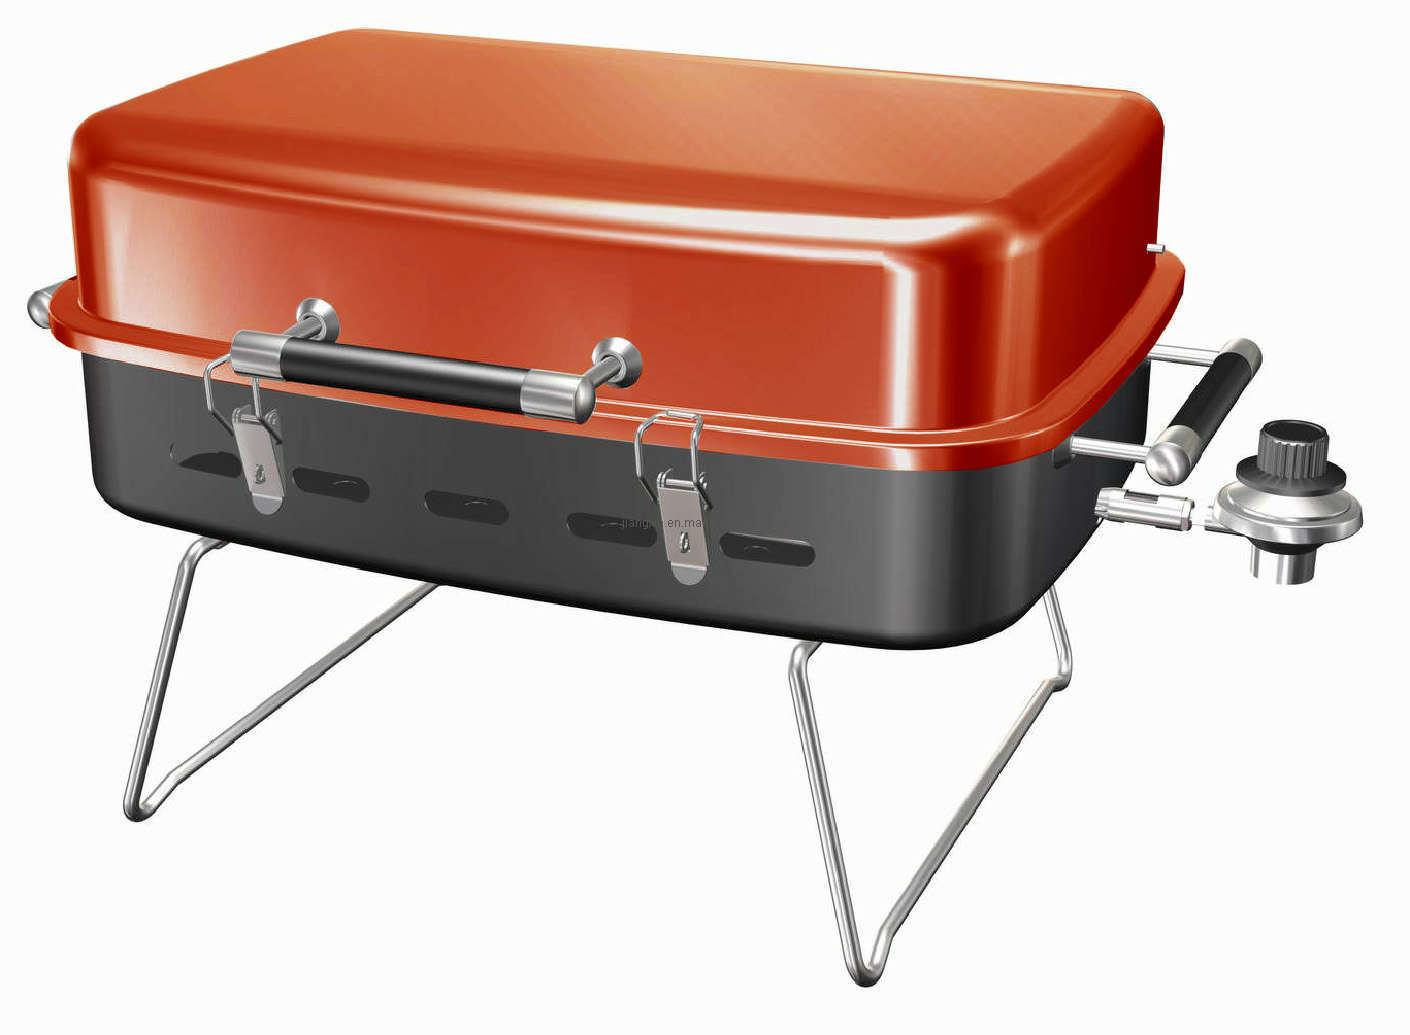 Portable Gas Bbq Grills : Tabletop gas bbq grills backyard grill review weber q